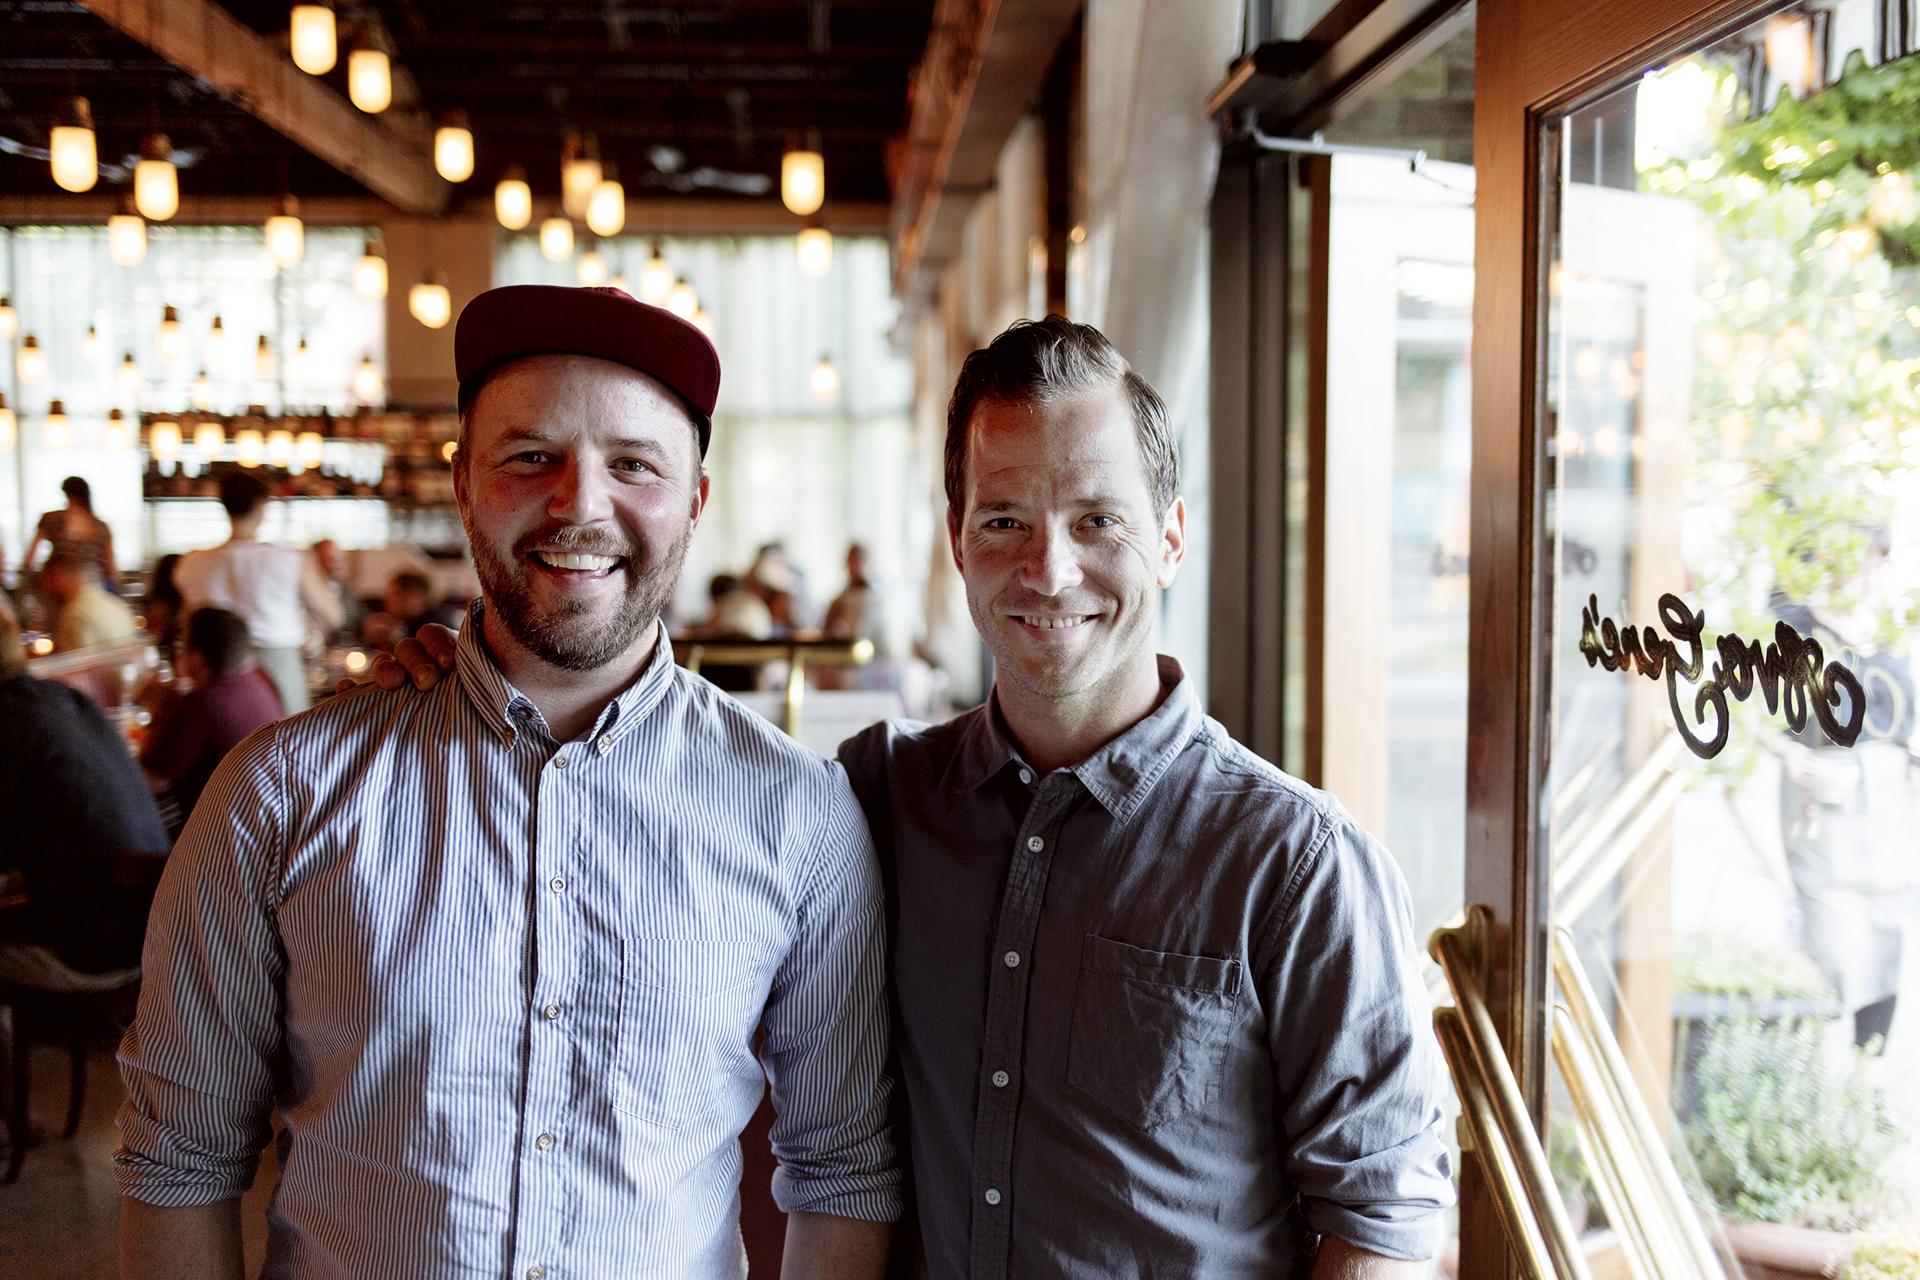 Joshua McFadden and Luke Dirks